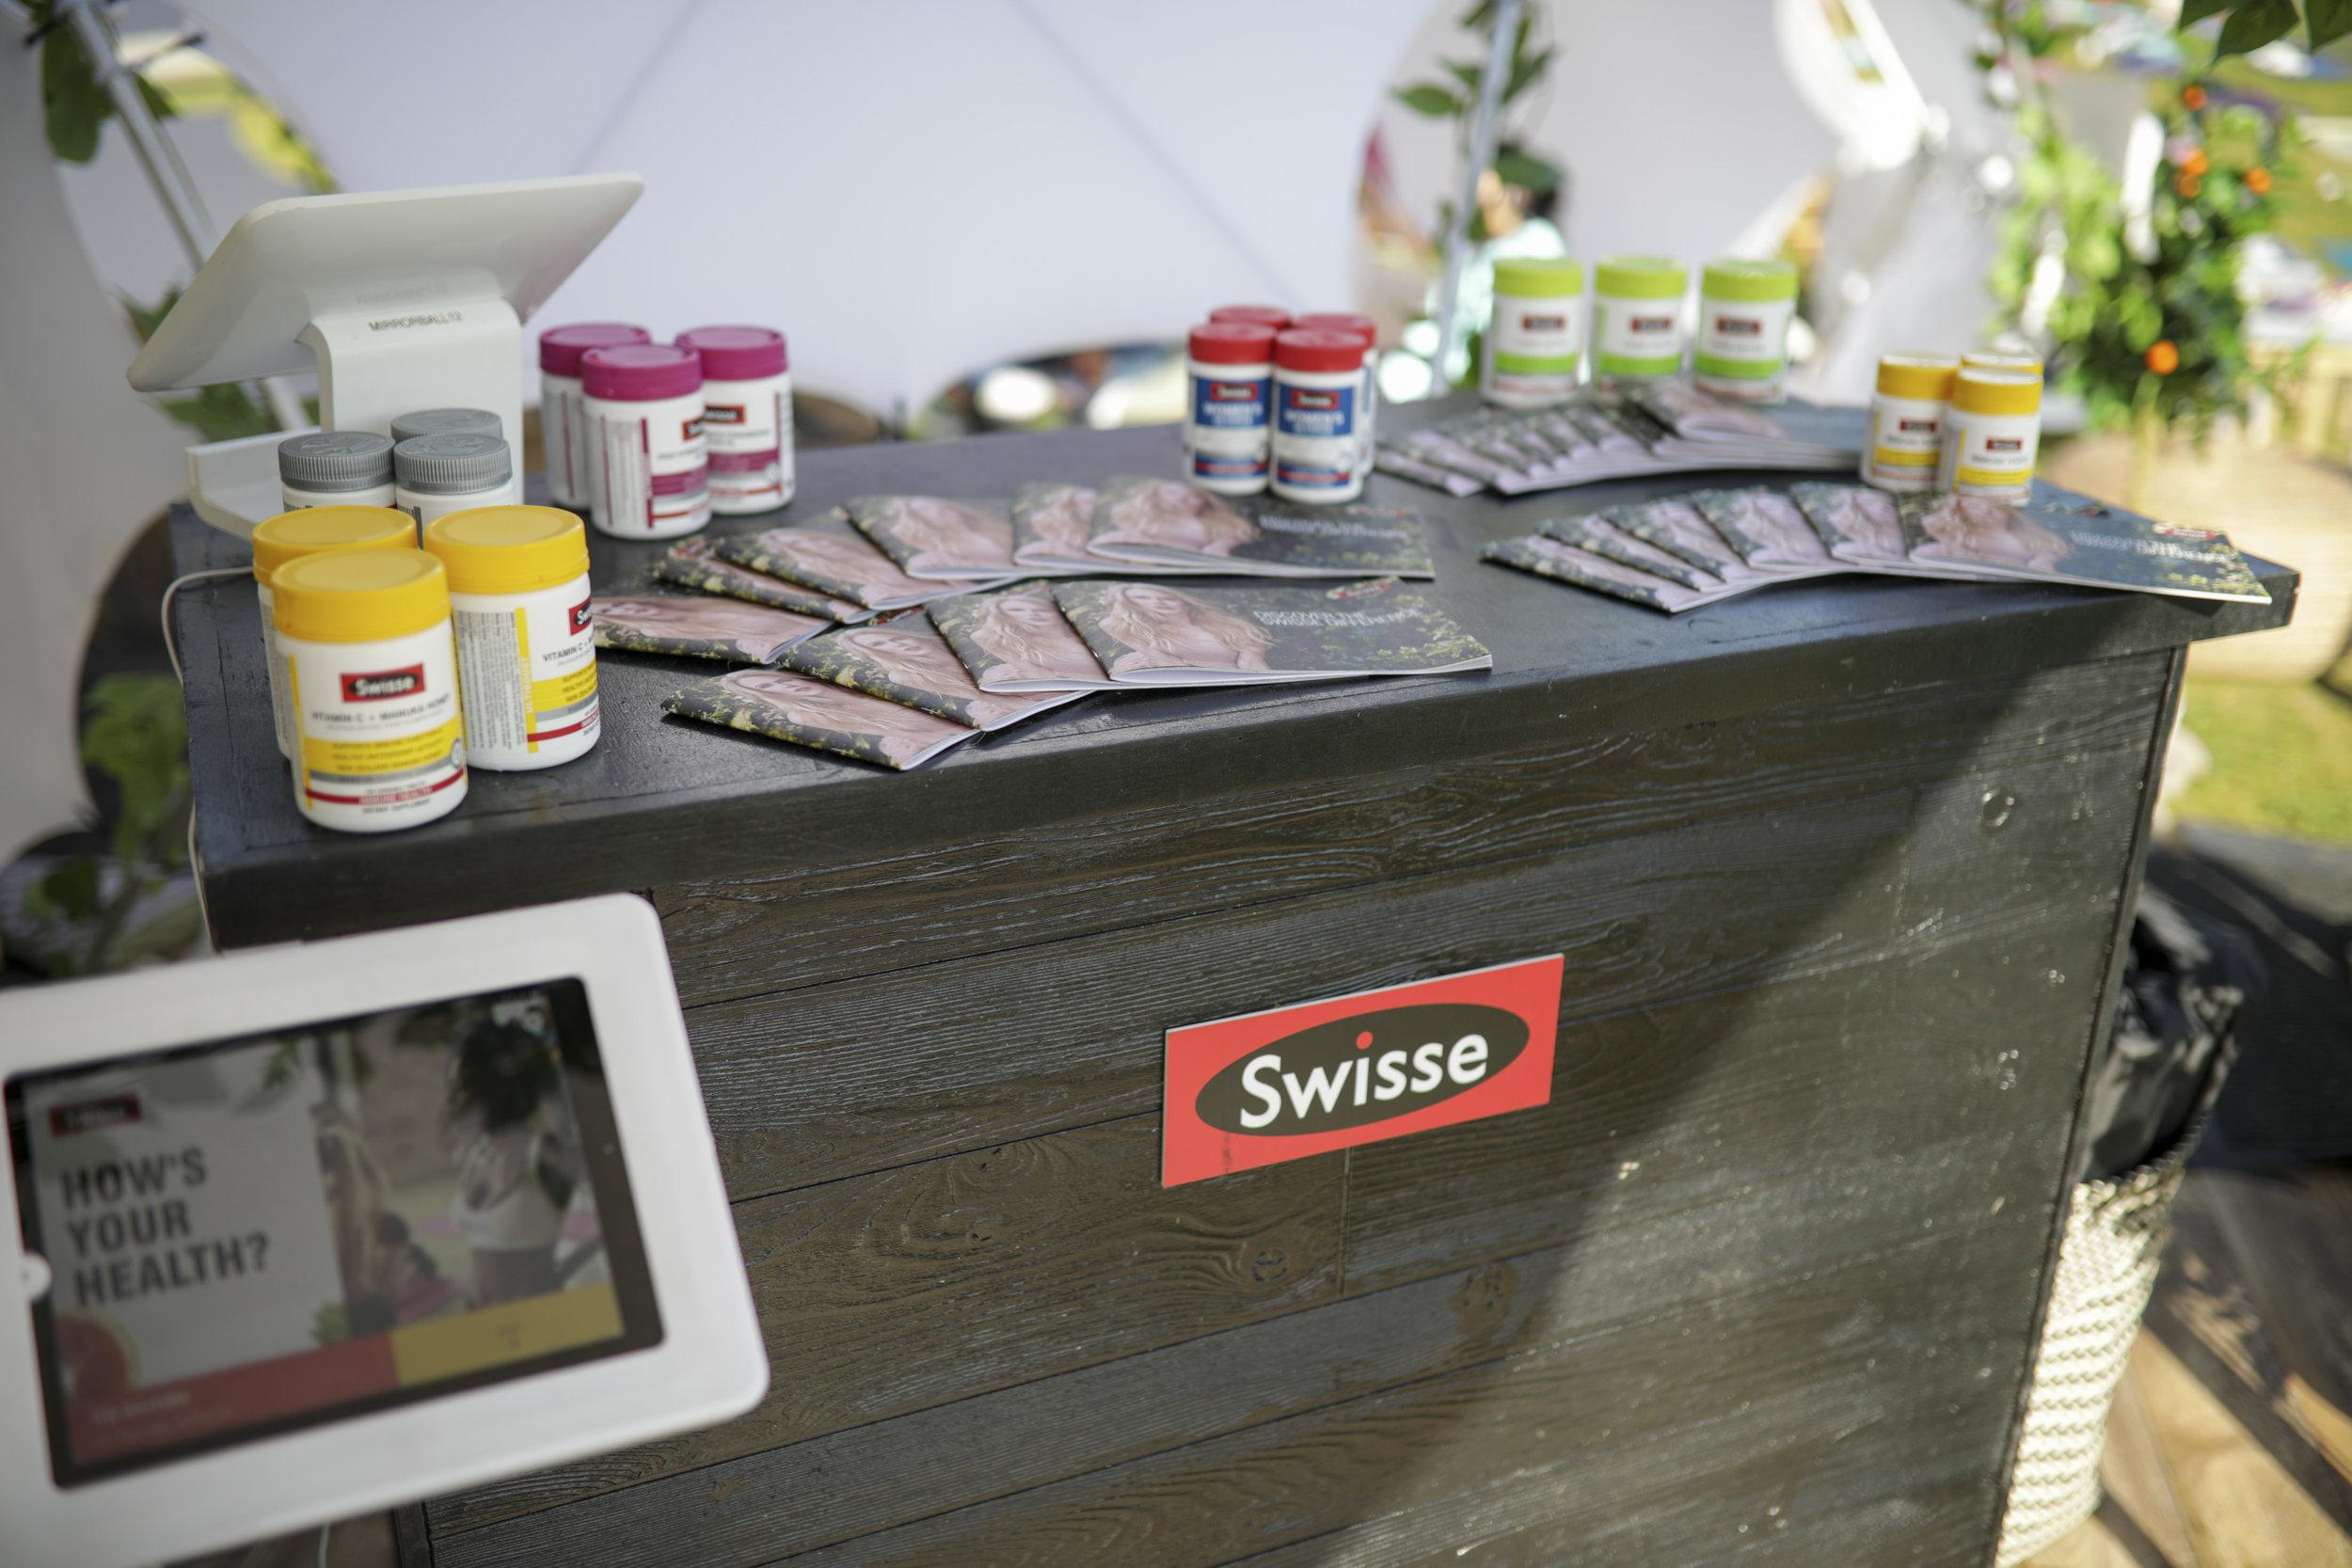 O Hello Media-Swisse-Wanderlust-A81A0427.jpg